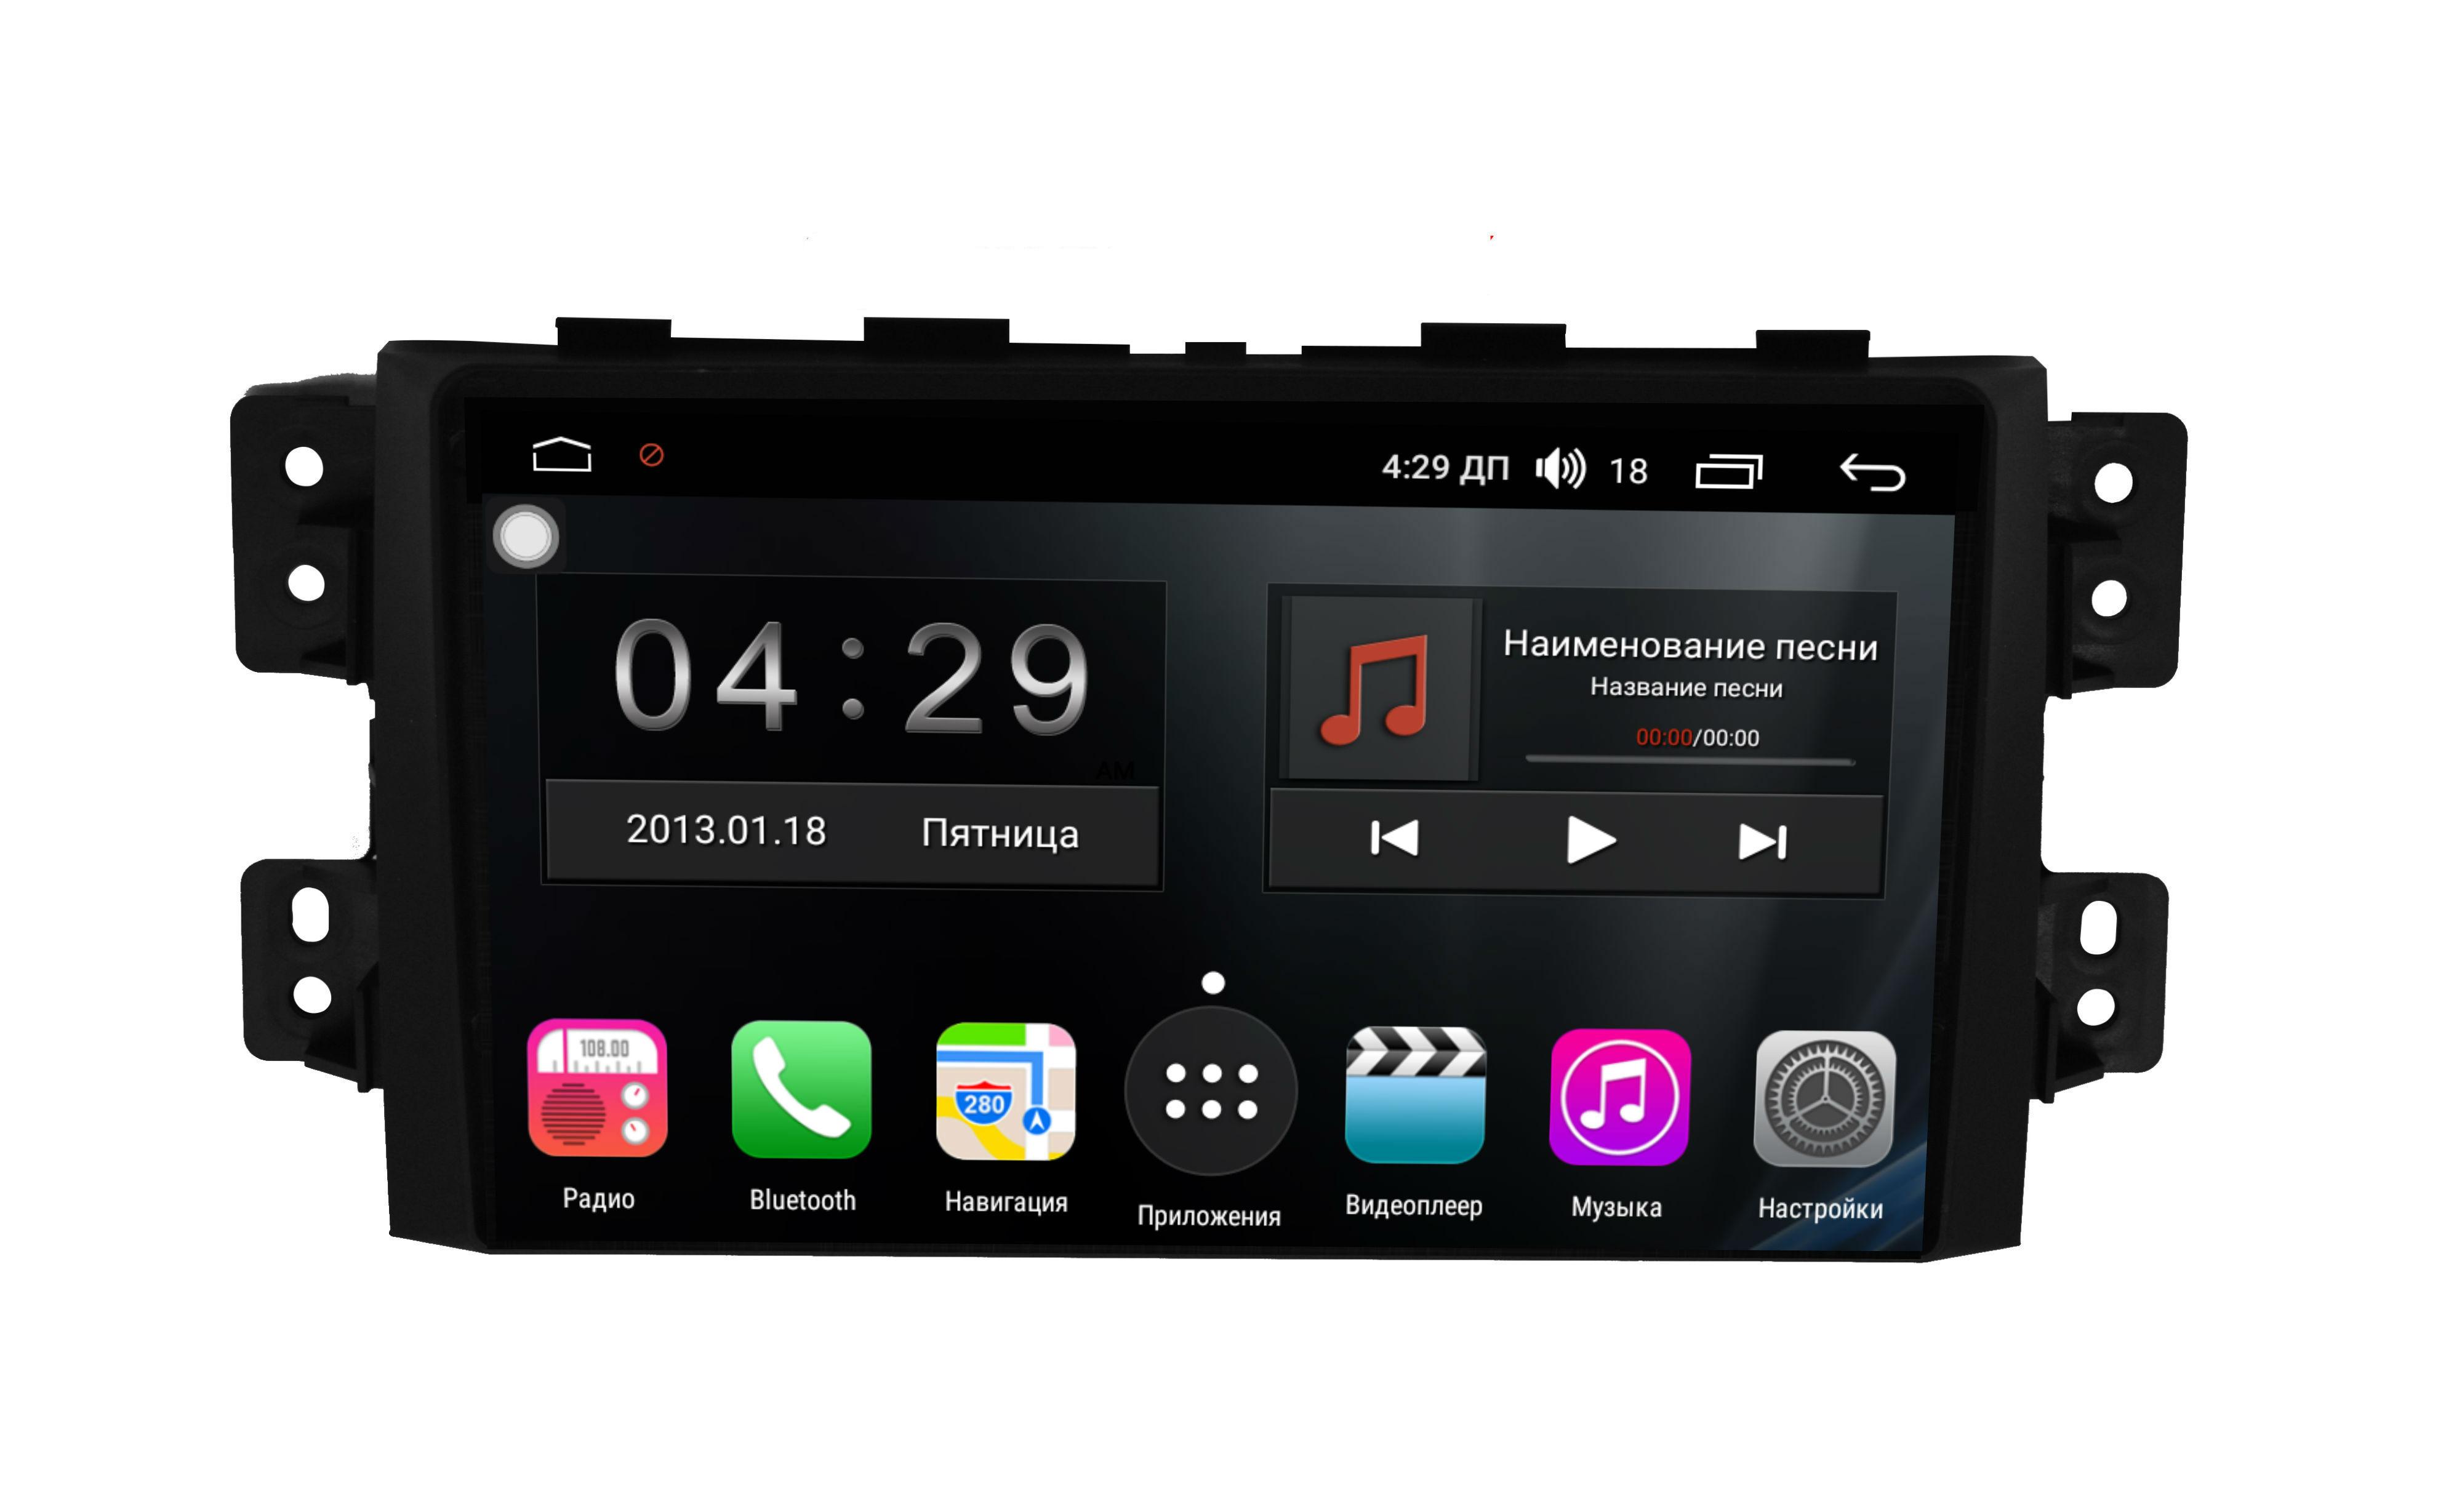 Штатная магнитола FarCar s300 для KIA Mohave на Android (RL465R) (+ Камера заднего вида в подарок!)